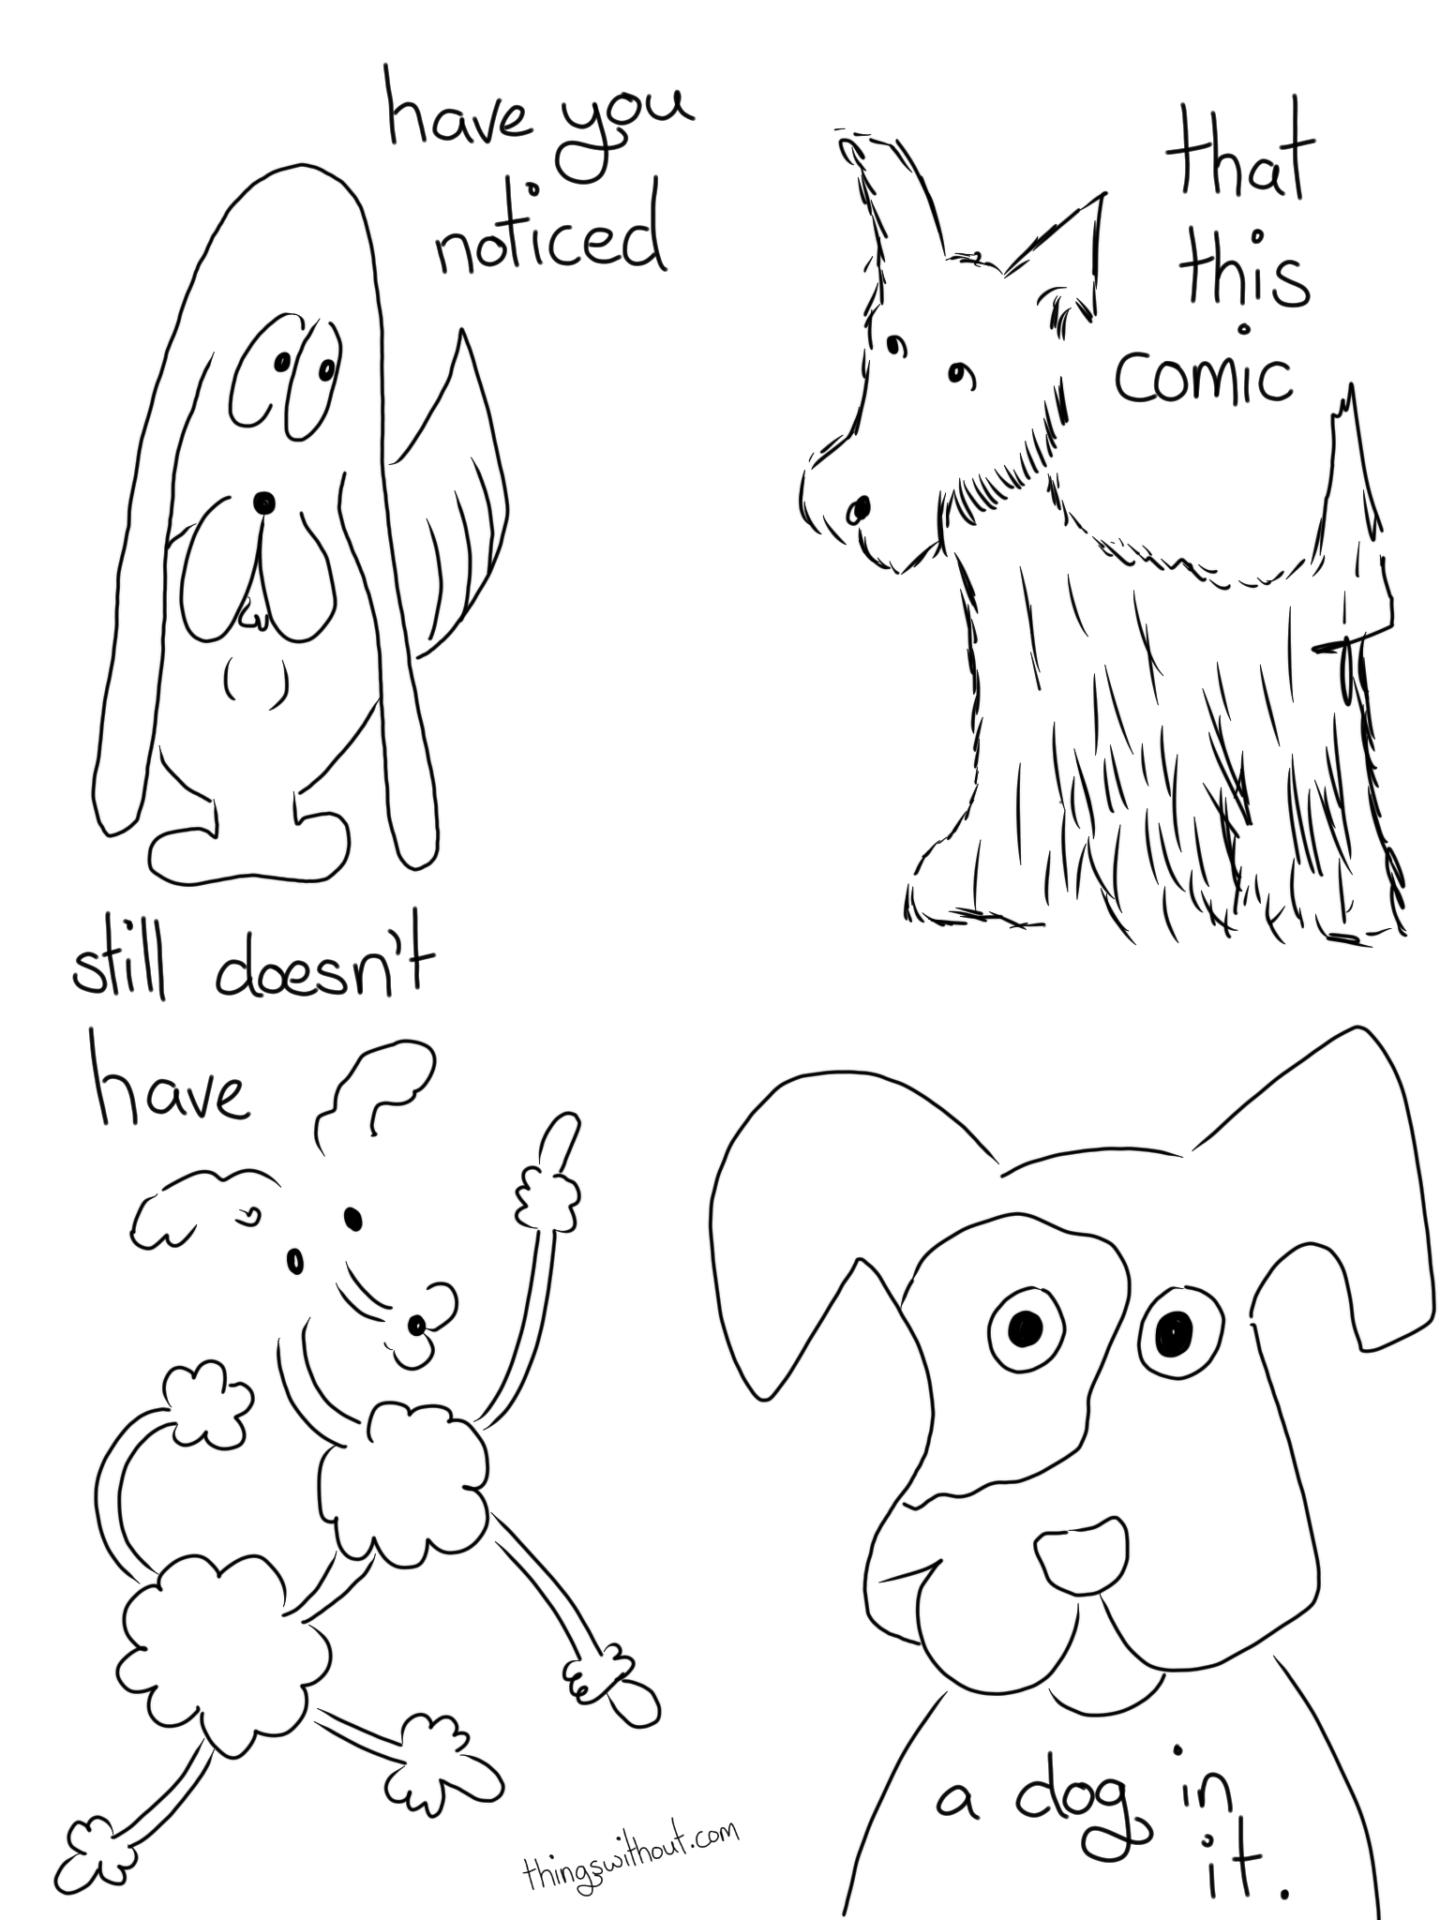 316: Doggies!